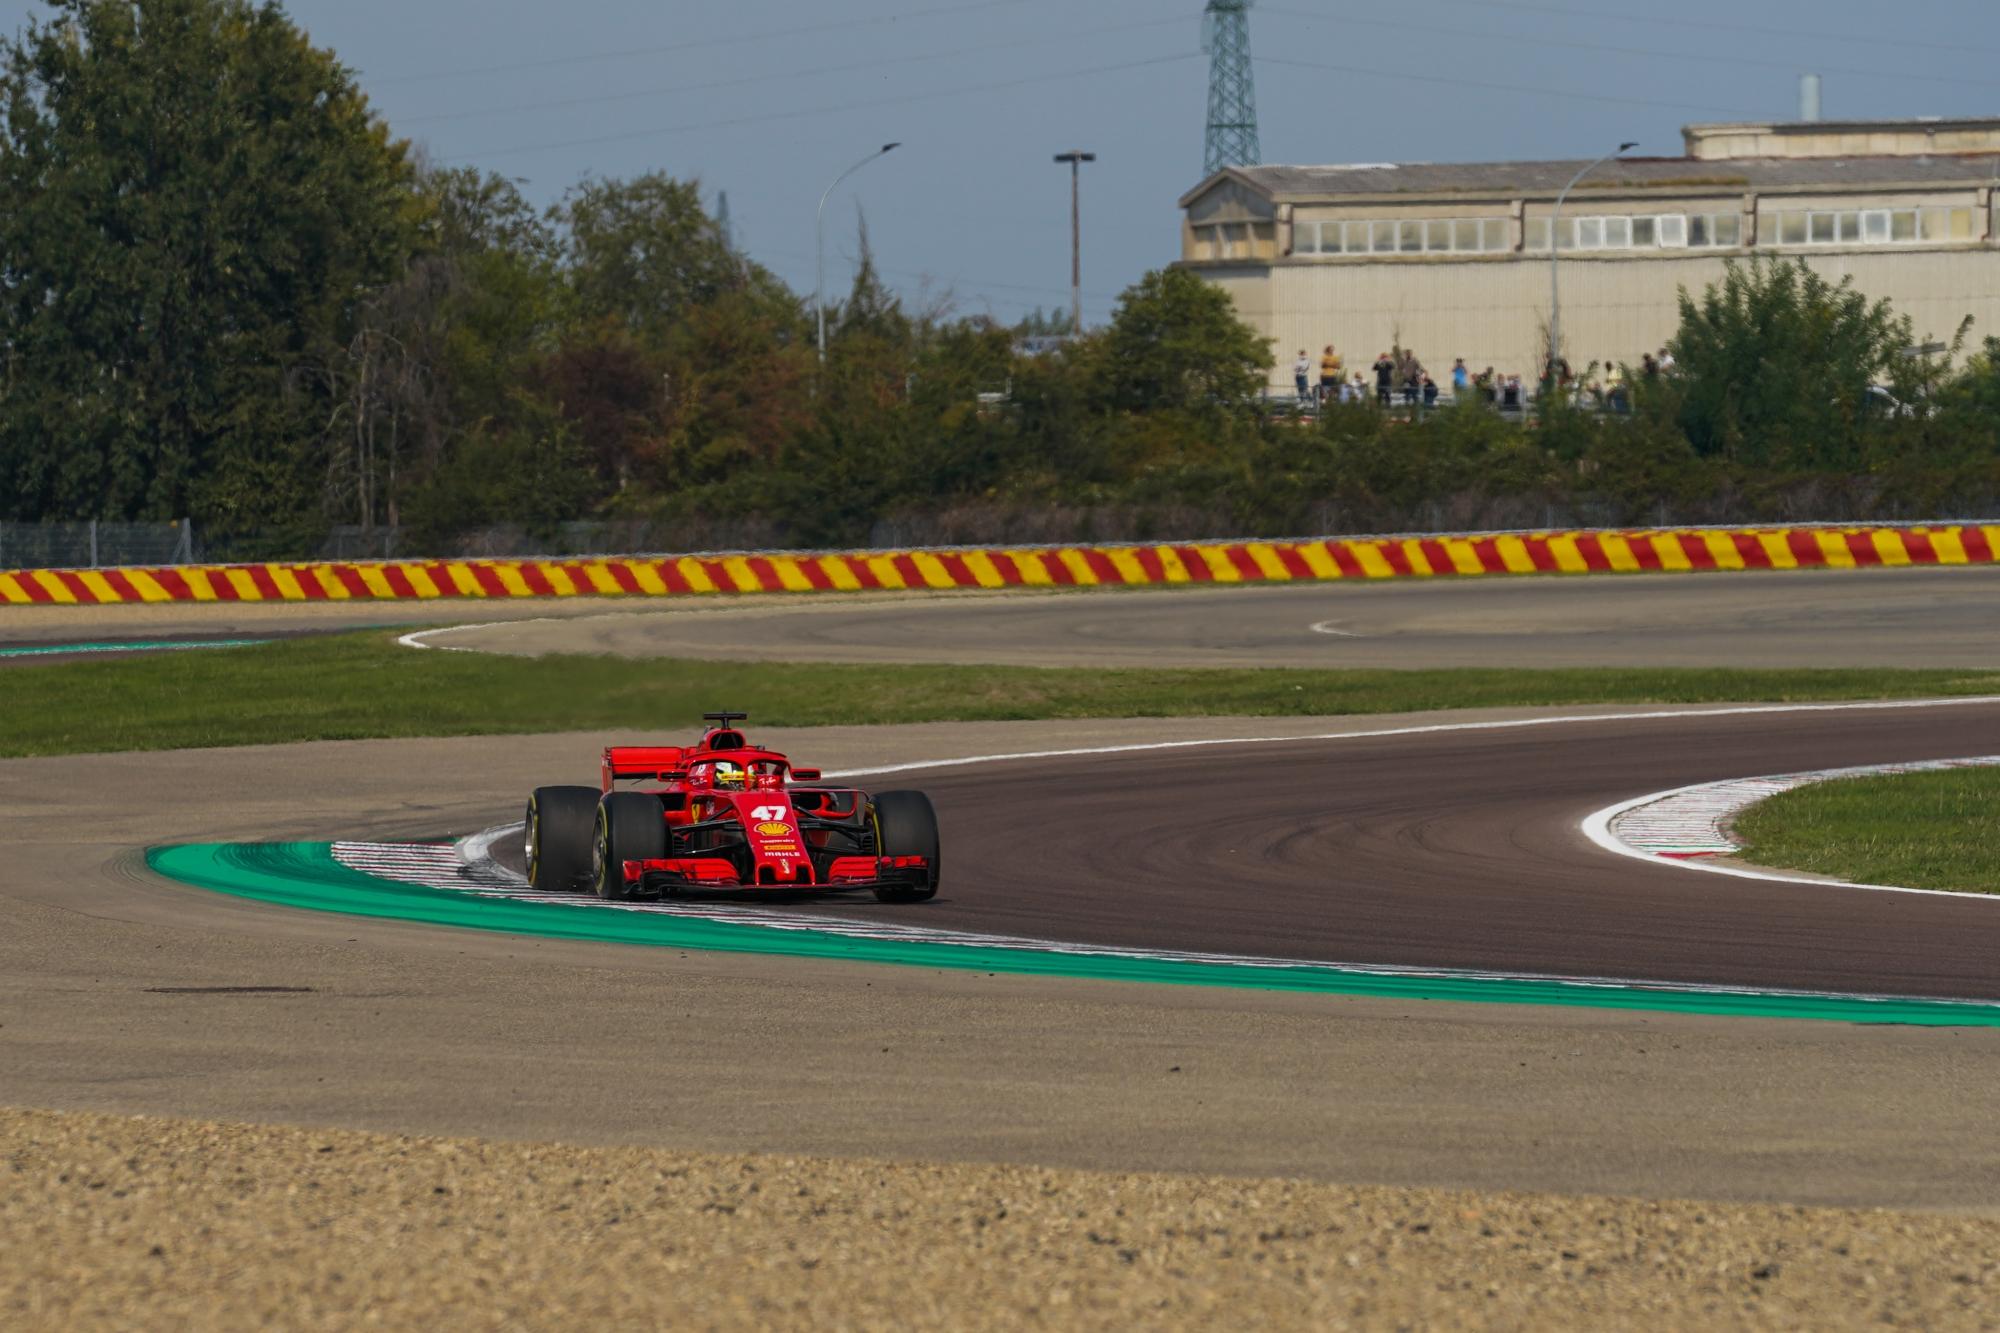 Fotó: Scuderia Ferrari Press Office